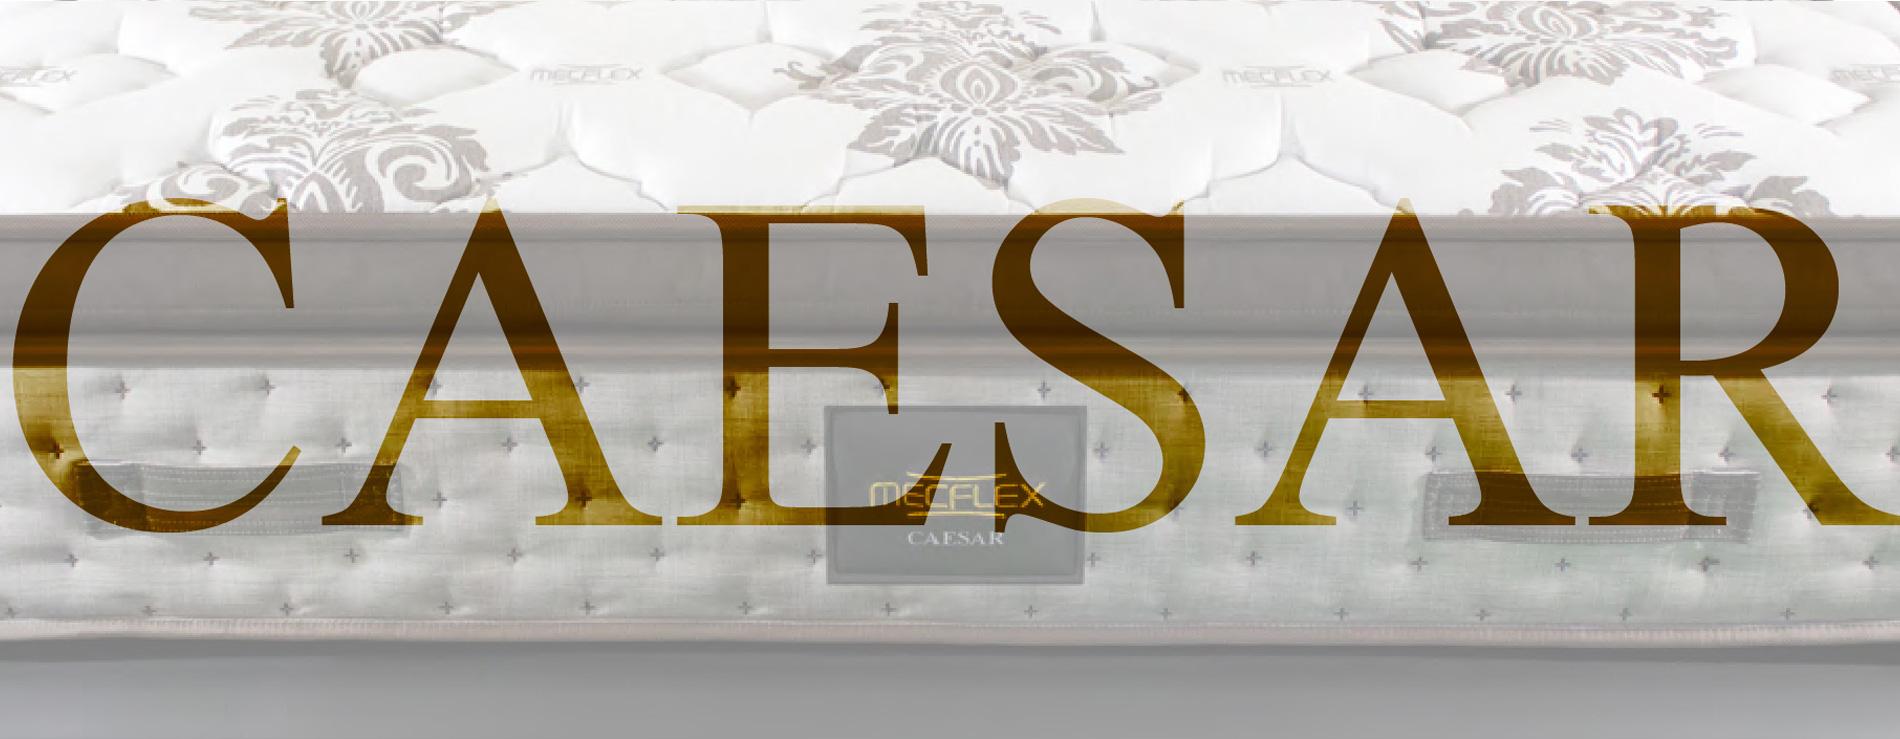 Materasso Caesar | Imperial collection | MecFlex